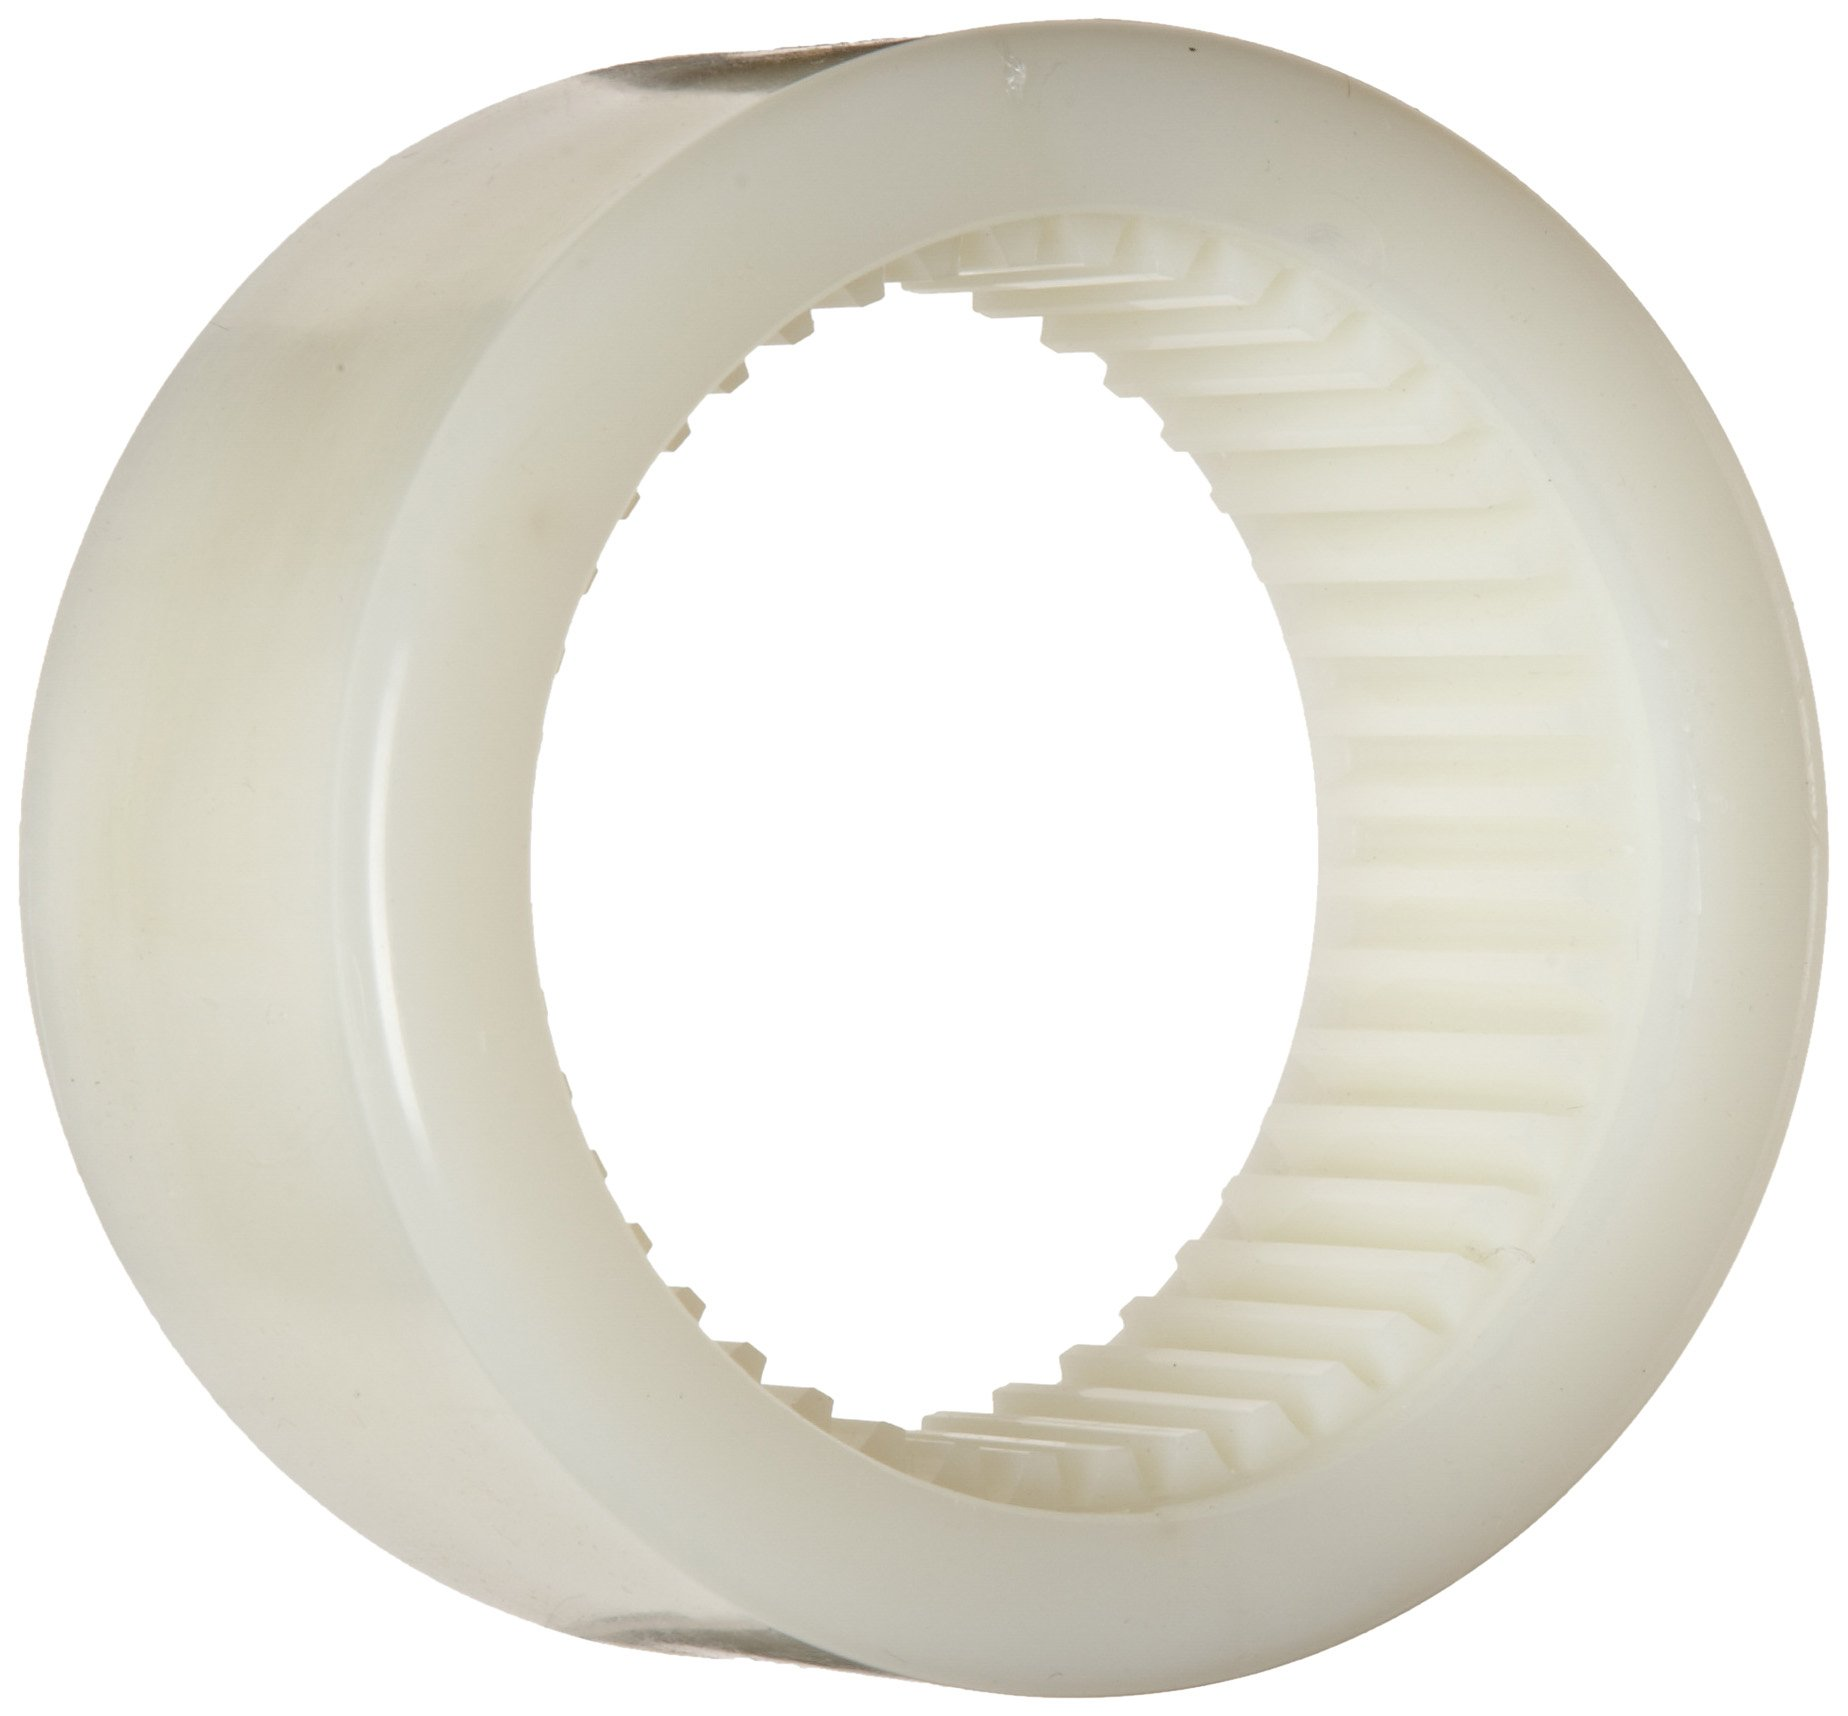 Lovejoy 00026 Sier-Bath Nyflex Nylon Sleeve Gear Coupling Sleeve Compoment